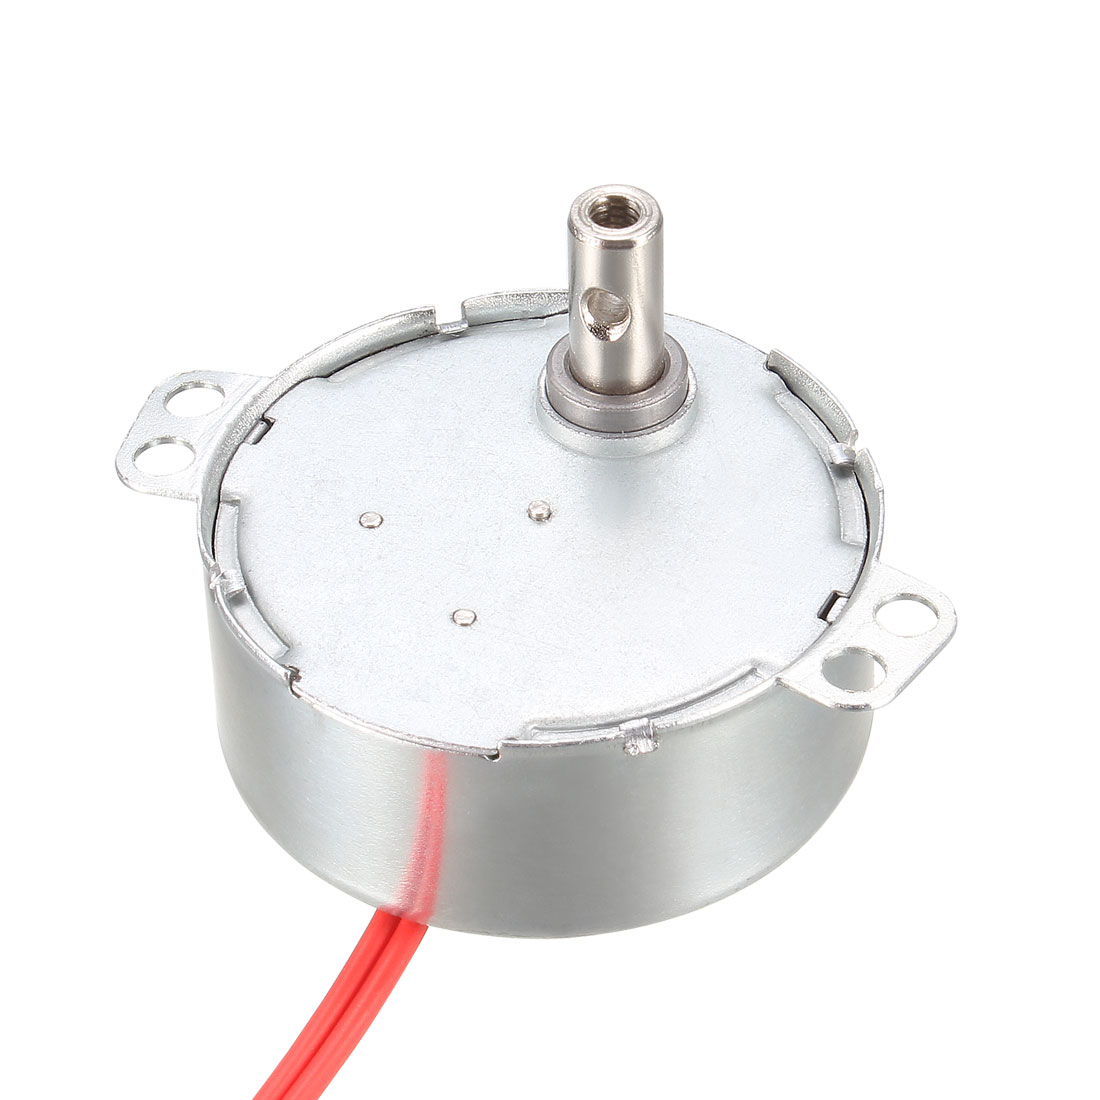 Synchronous Synchron Motor - Turntable Motor AC 24V 50-60Hz CCW/CW 4W 30-36RPM